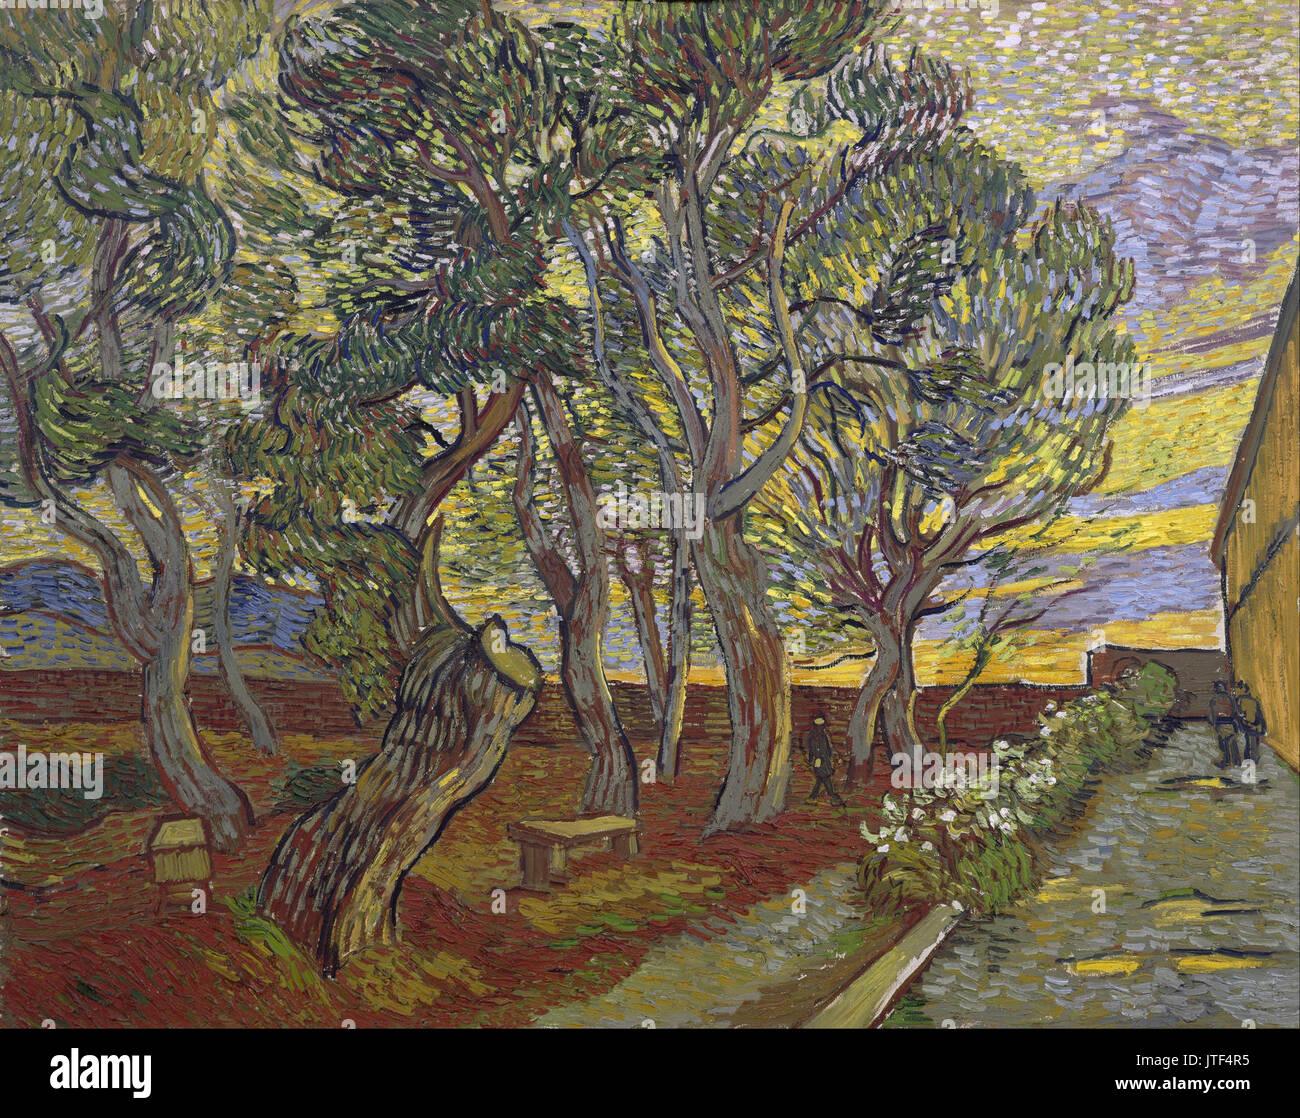 Gogh Garden Painting Stock Photos & Gogh Garden Painting Stock ...